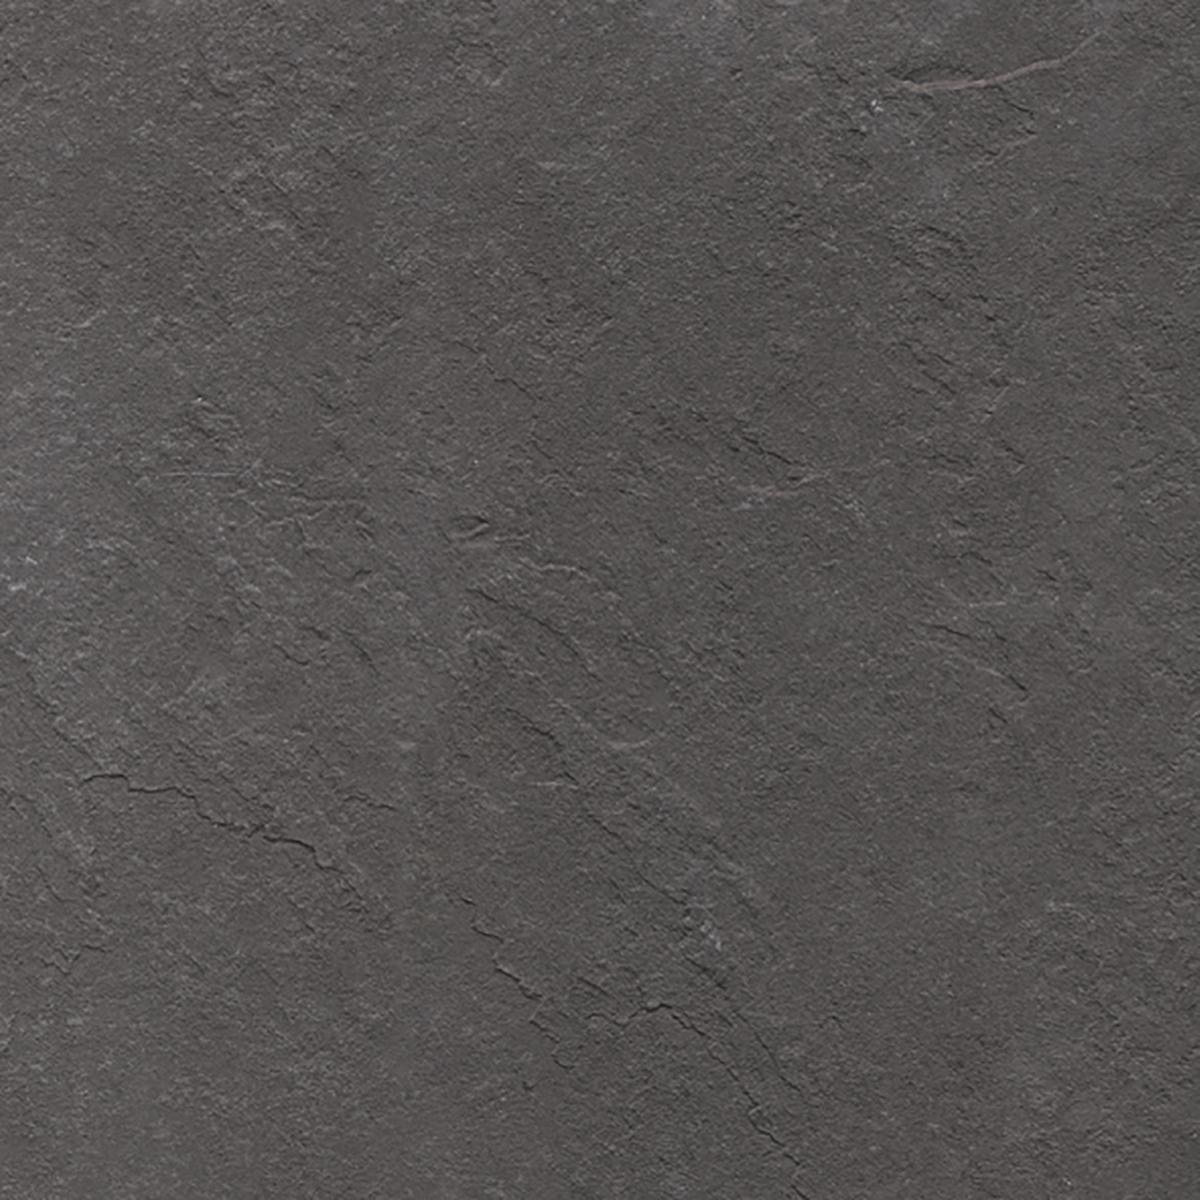 Plaza Natural Slate 60x60 zwarte vloertegel